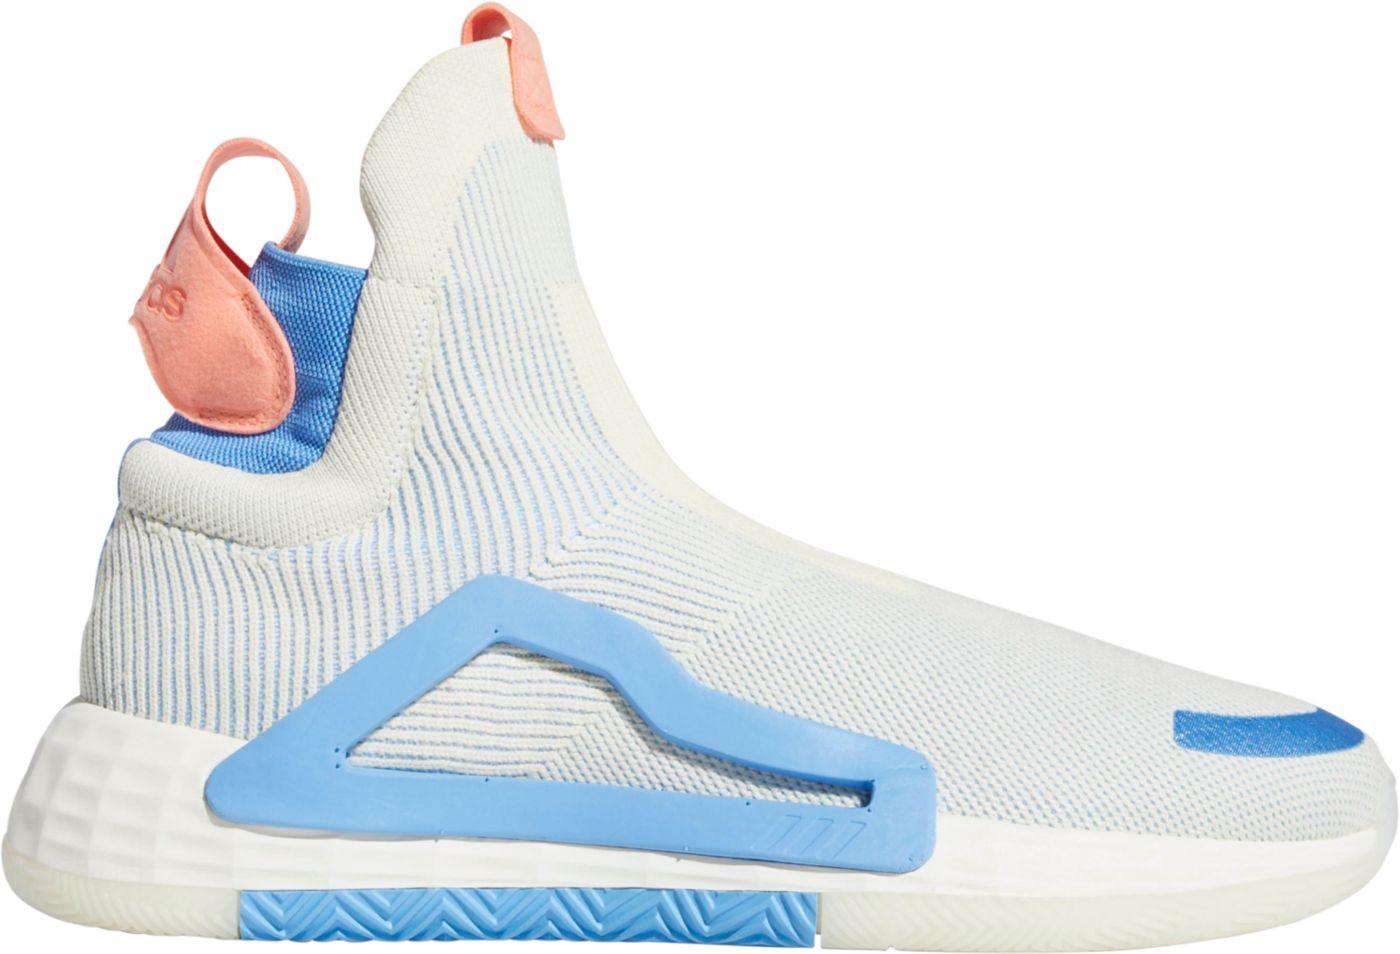 adidas N3XT L3V3L Basketball Shoes